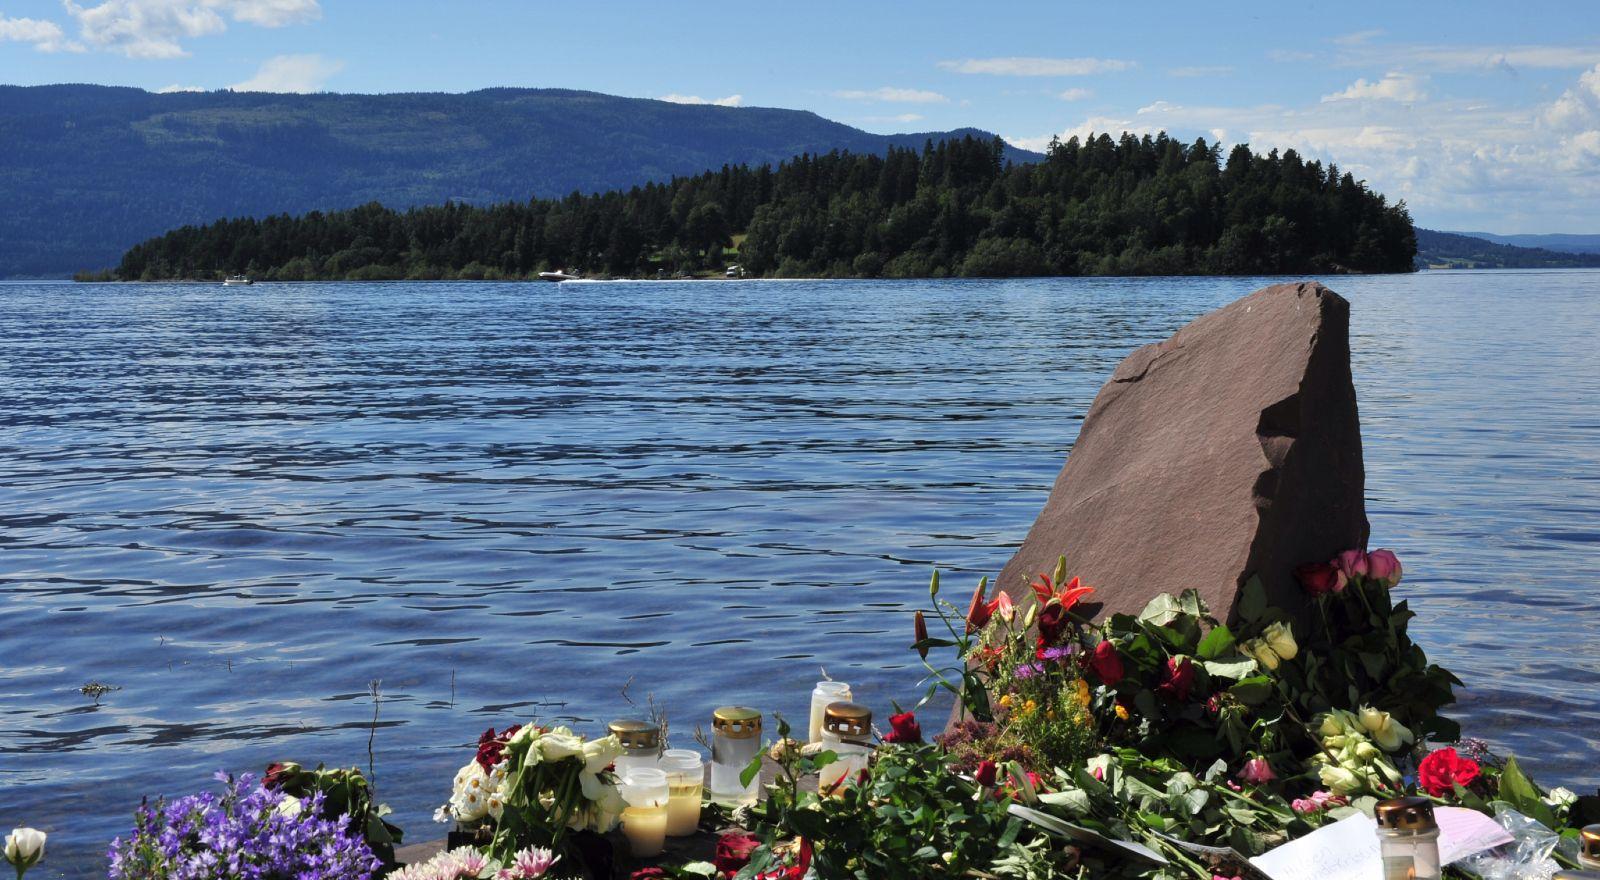 Flowers on Utøya island in Norway